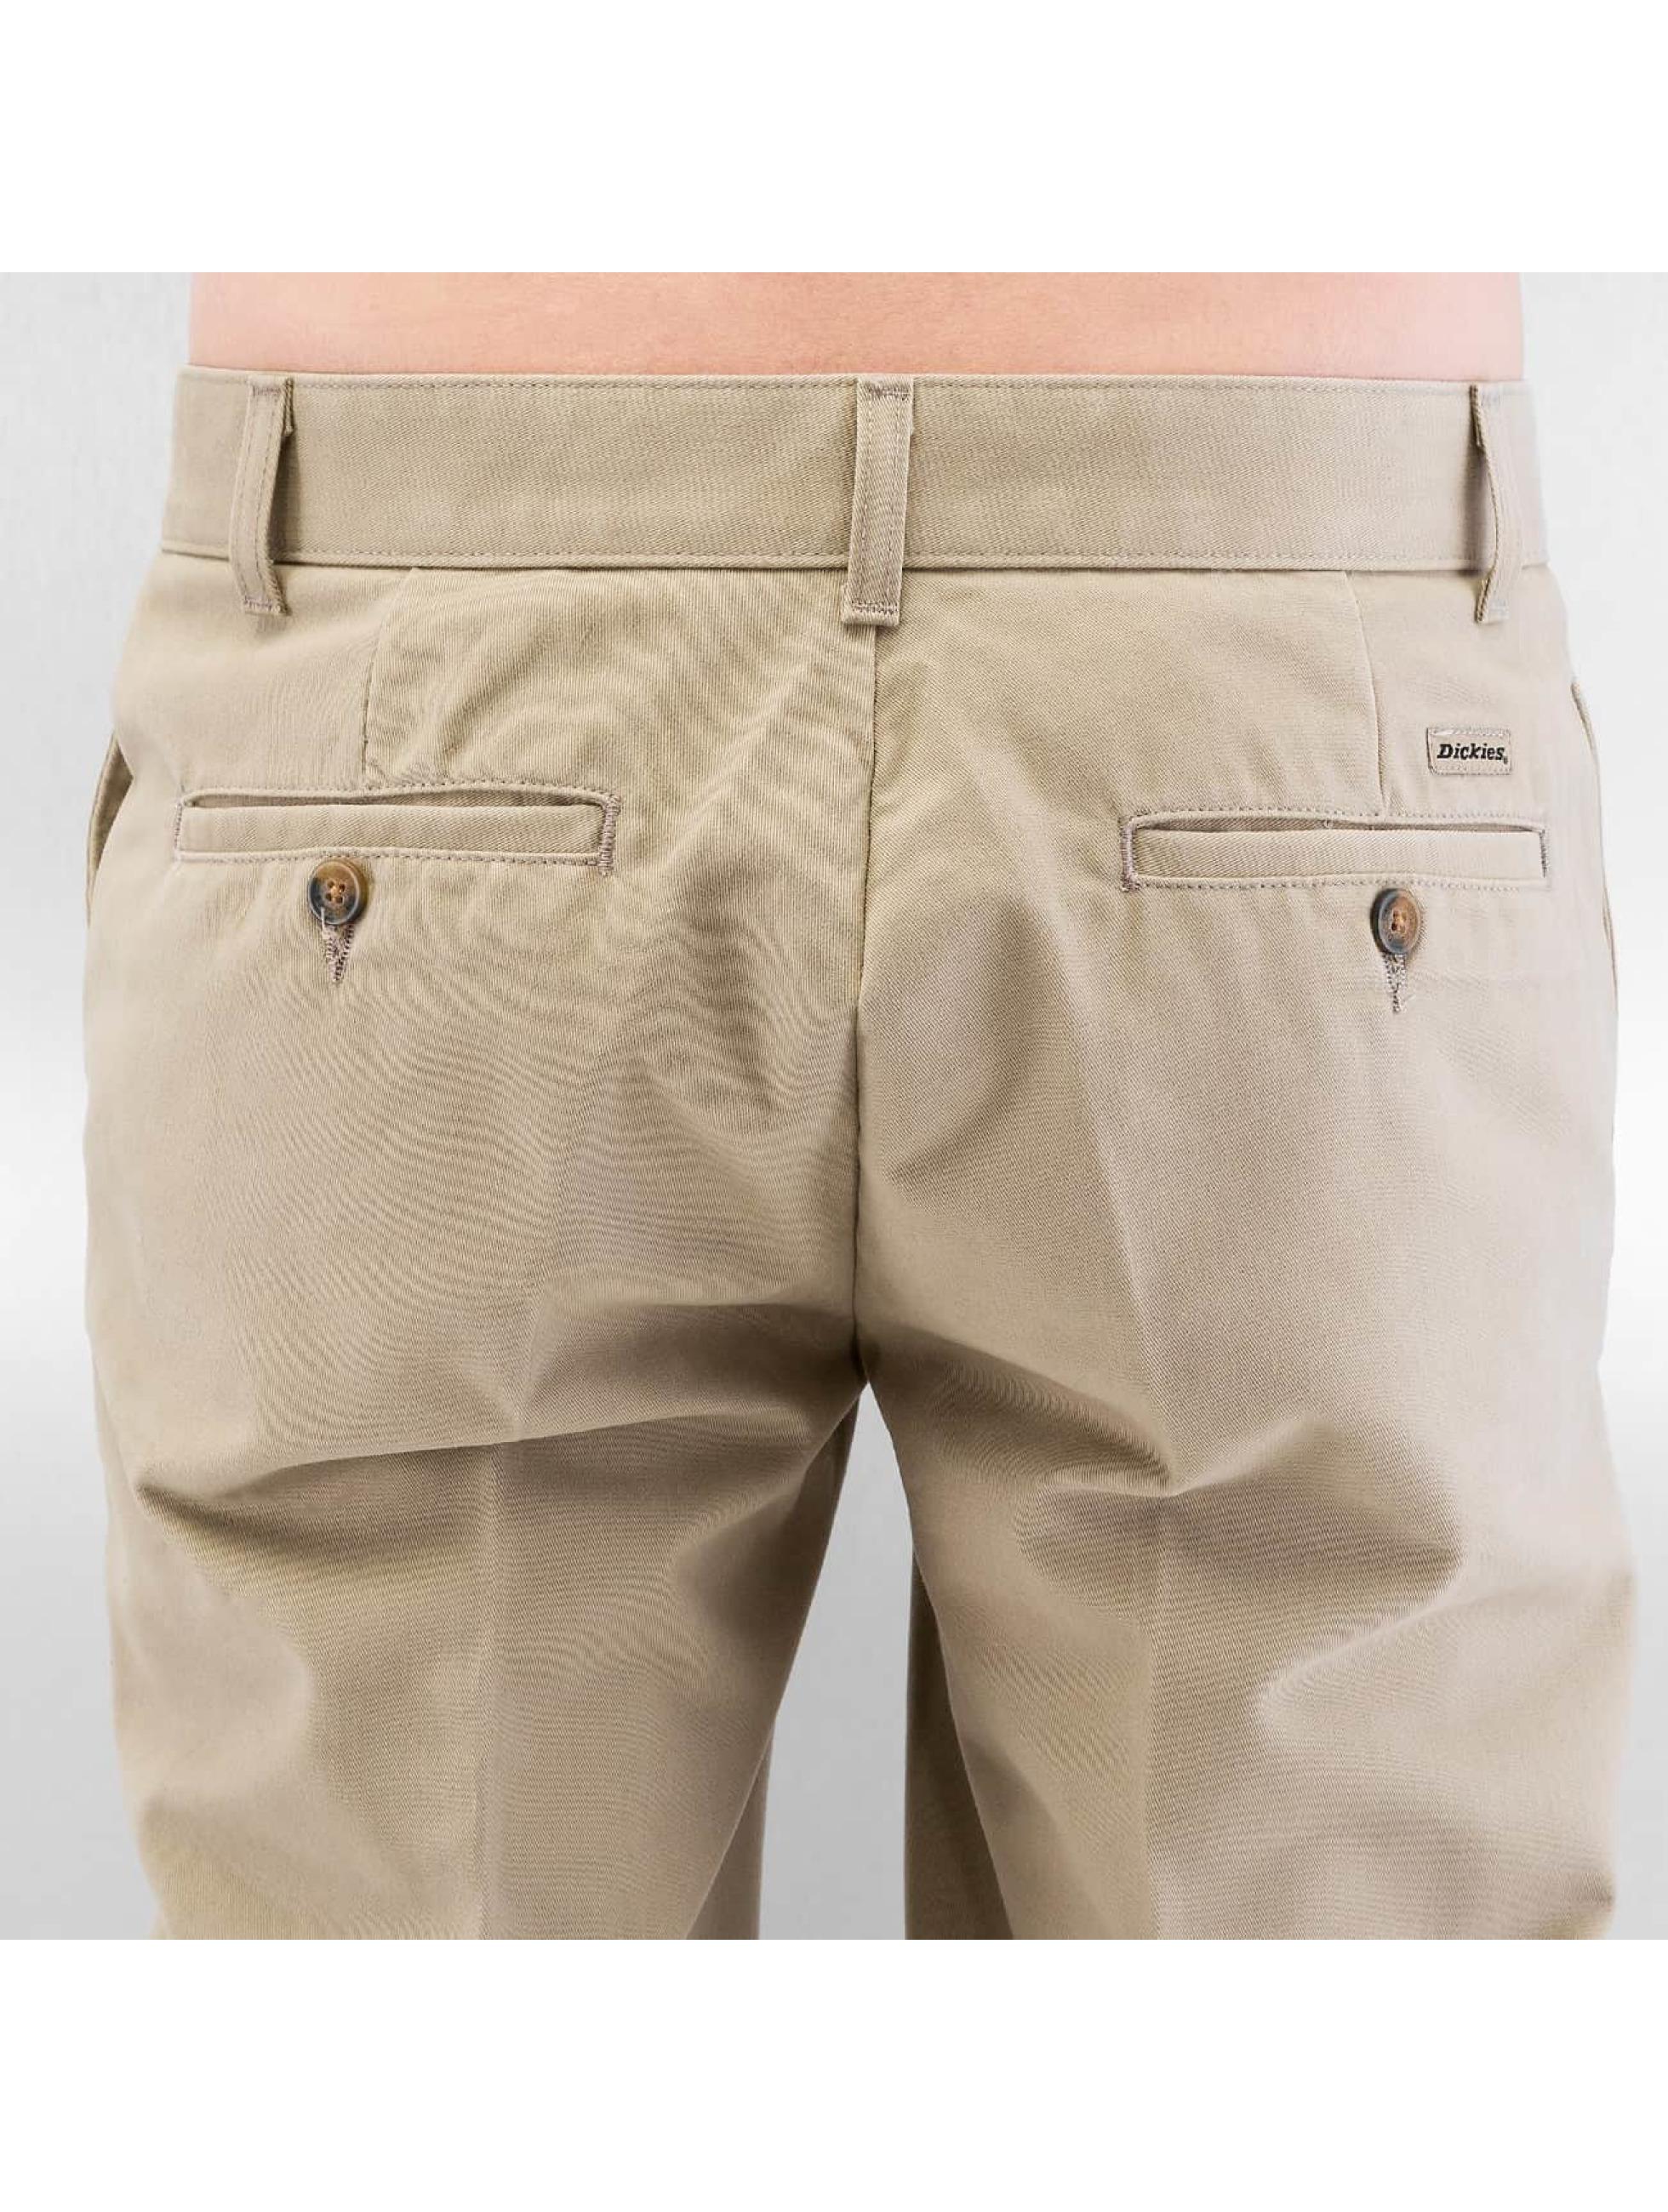 Dickies Pantalon chino Khaki kaki